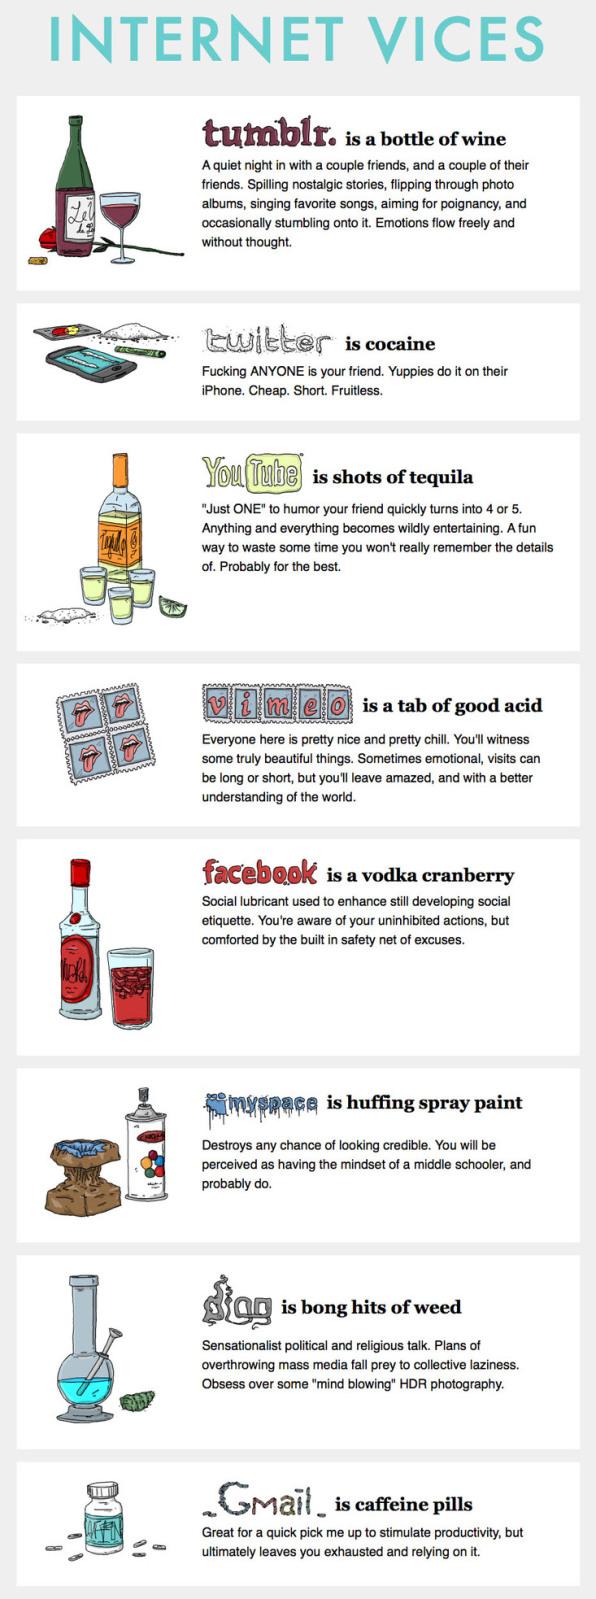 Social Media Vices